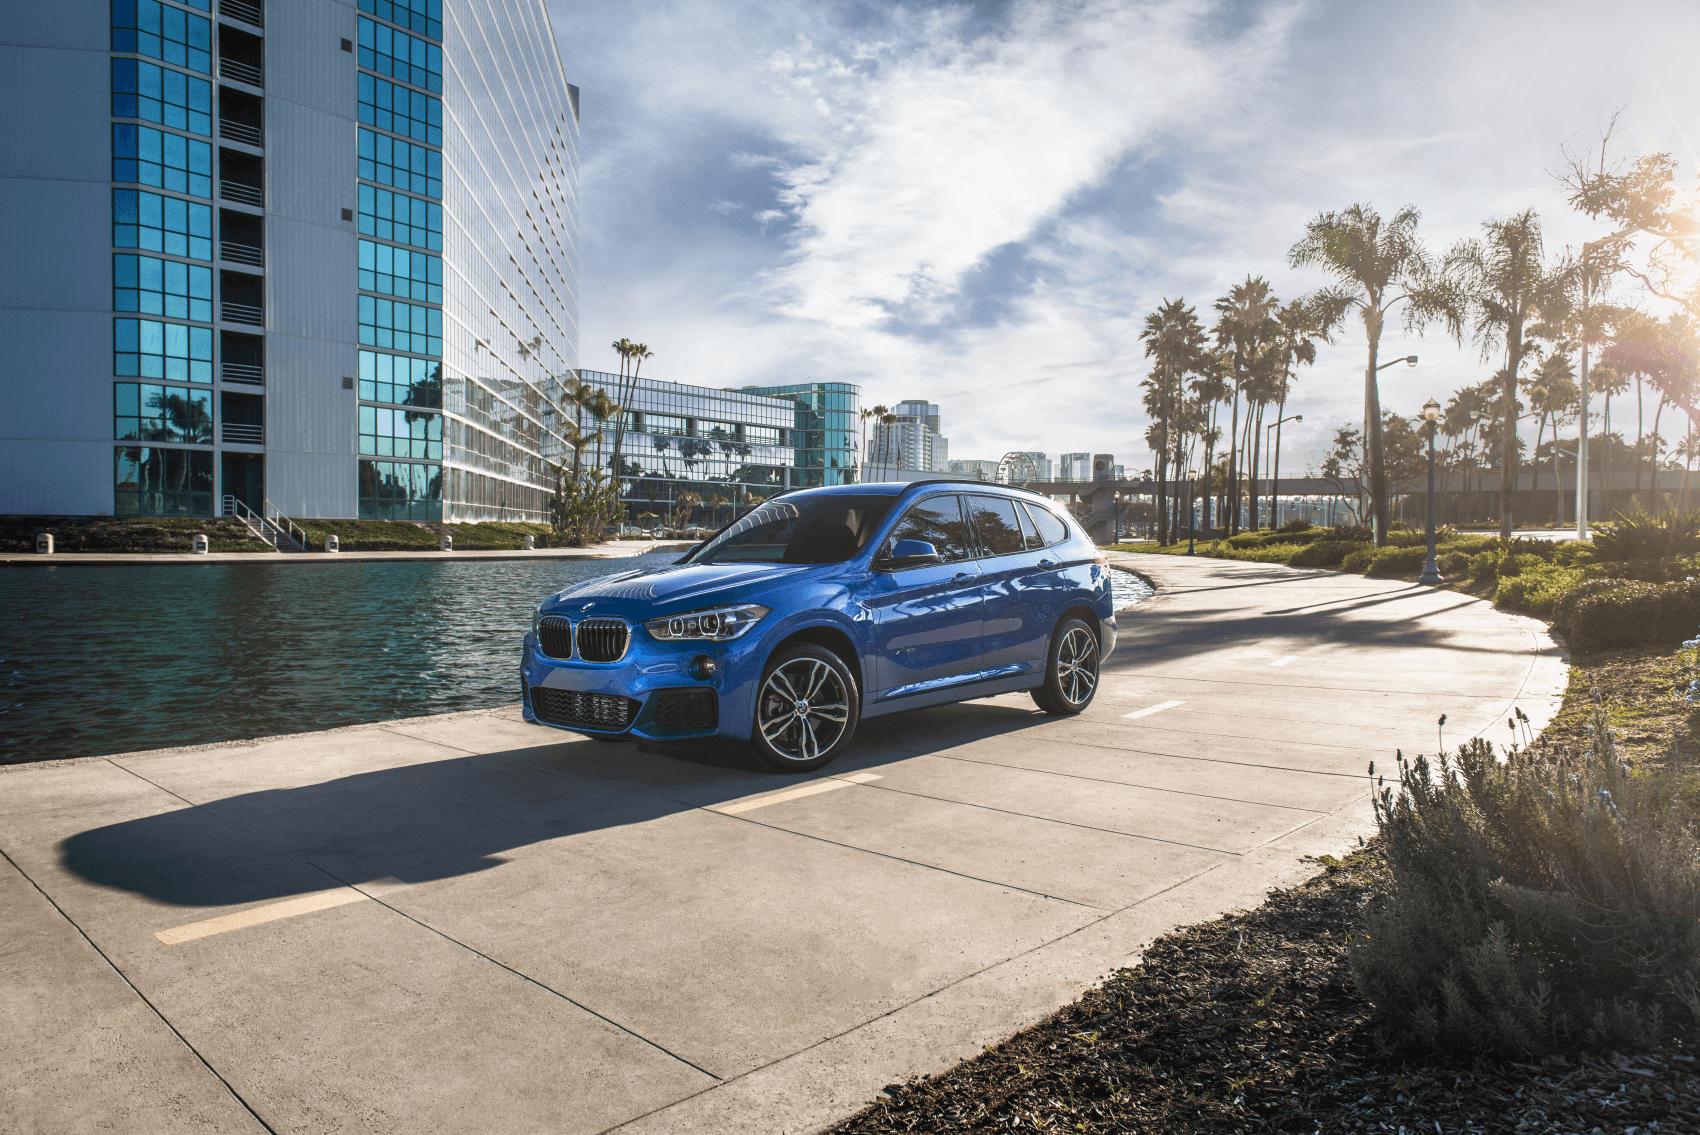 BMW X1 Blue Corner